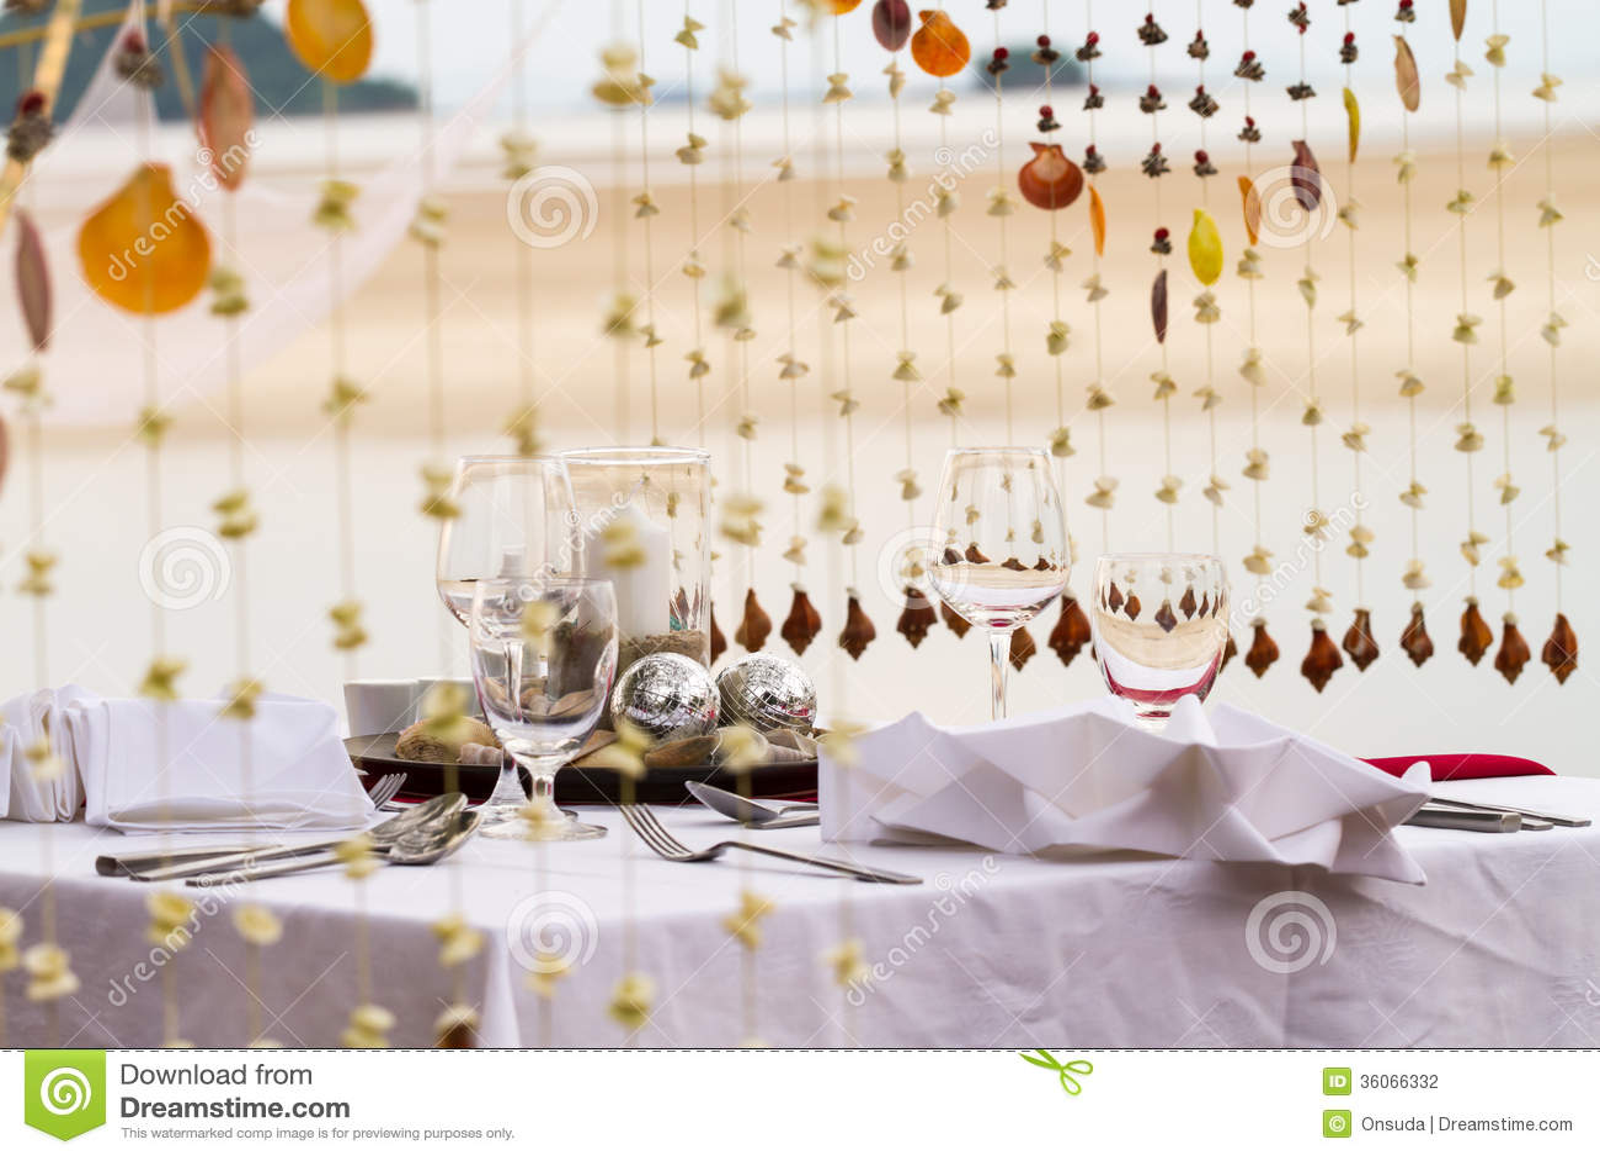 Sea Theme Table Setup For Dinner Stock Photography Image